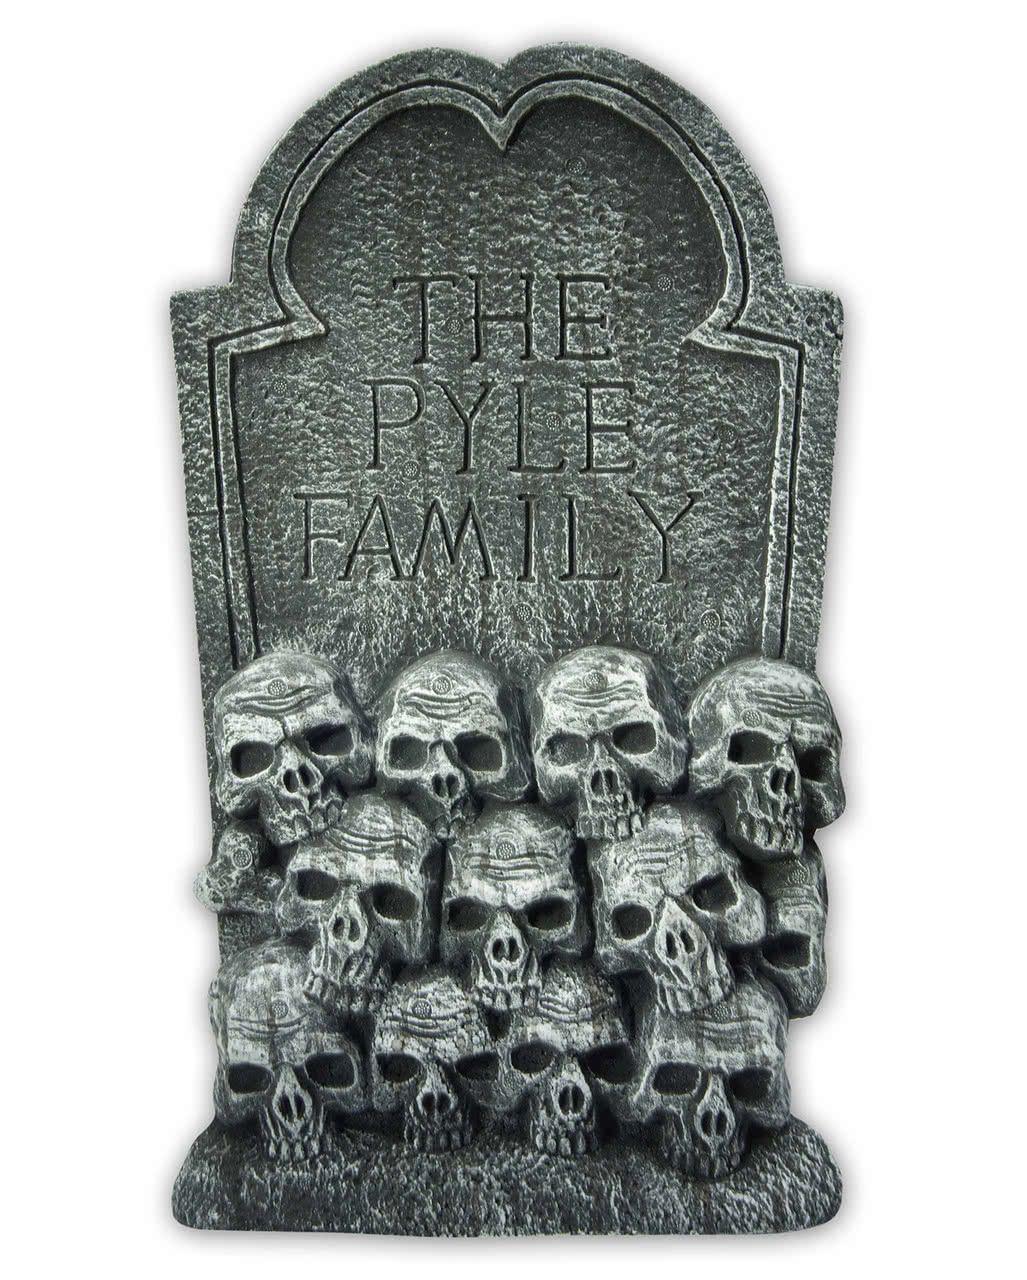 Grave Stone With Skulls For Cemetery Decoration Horror Shop Com Halloween Gravestones Cemetery Decorations Halloween Tombstones